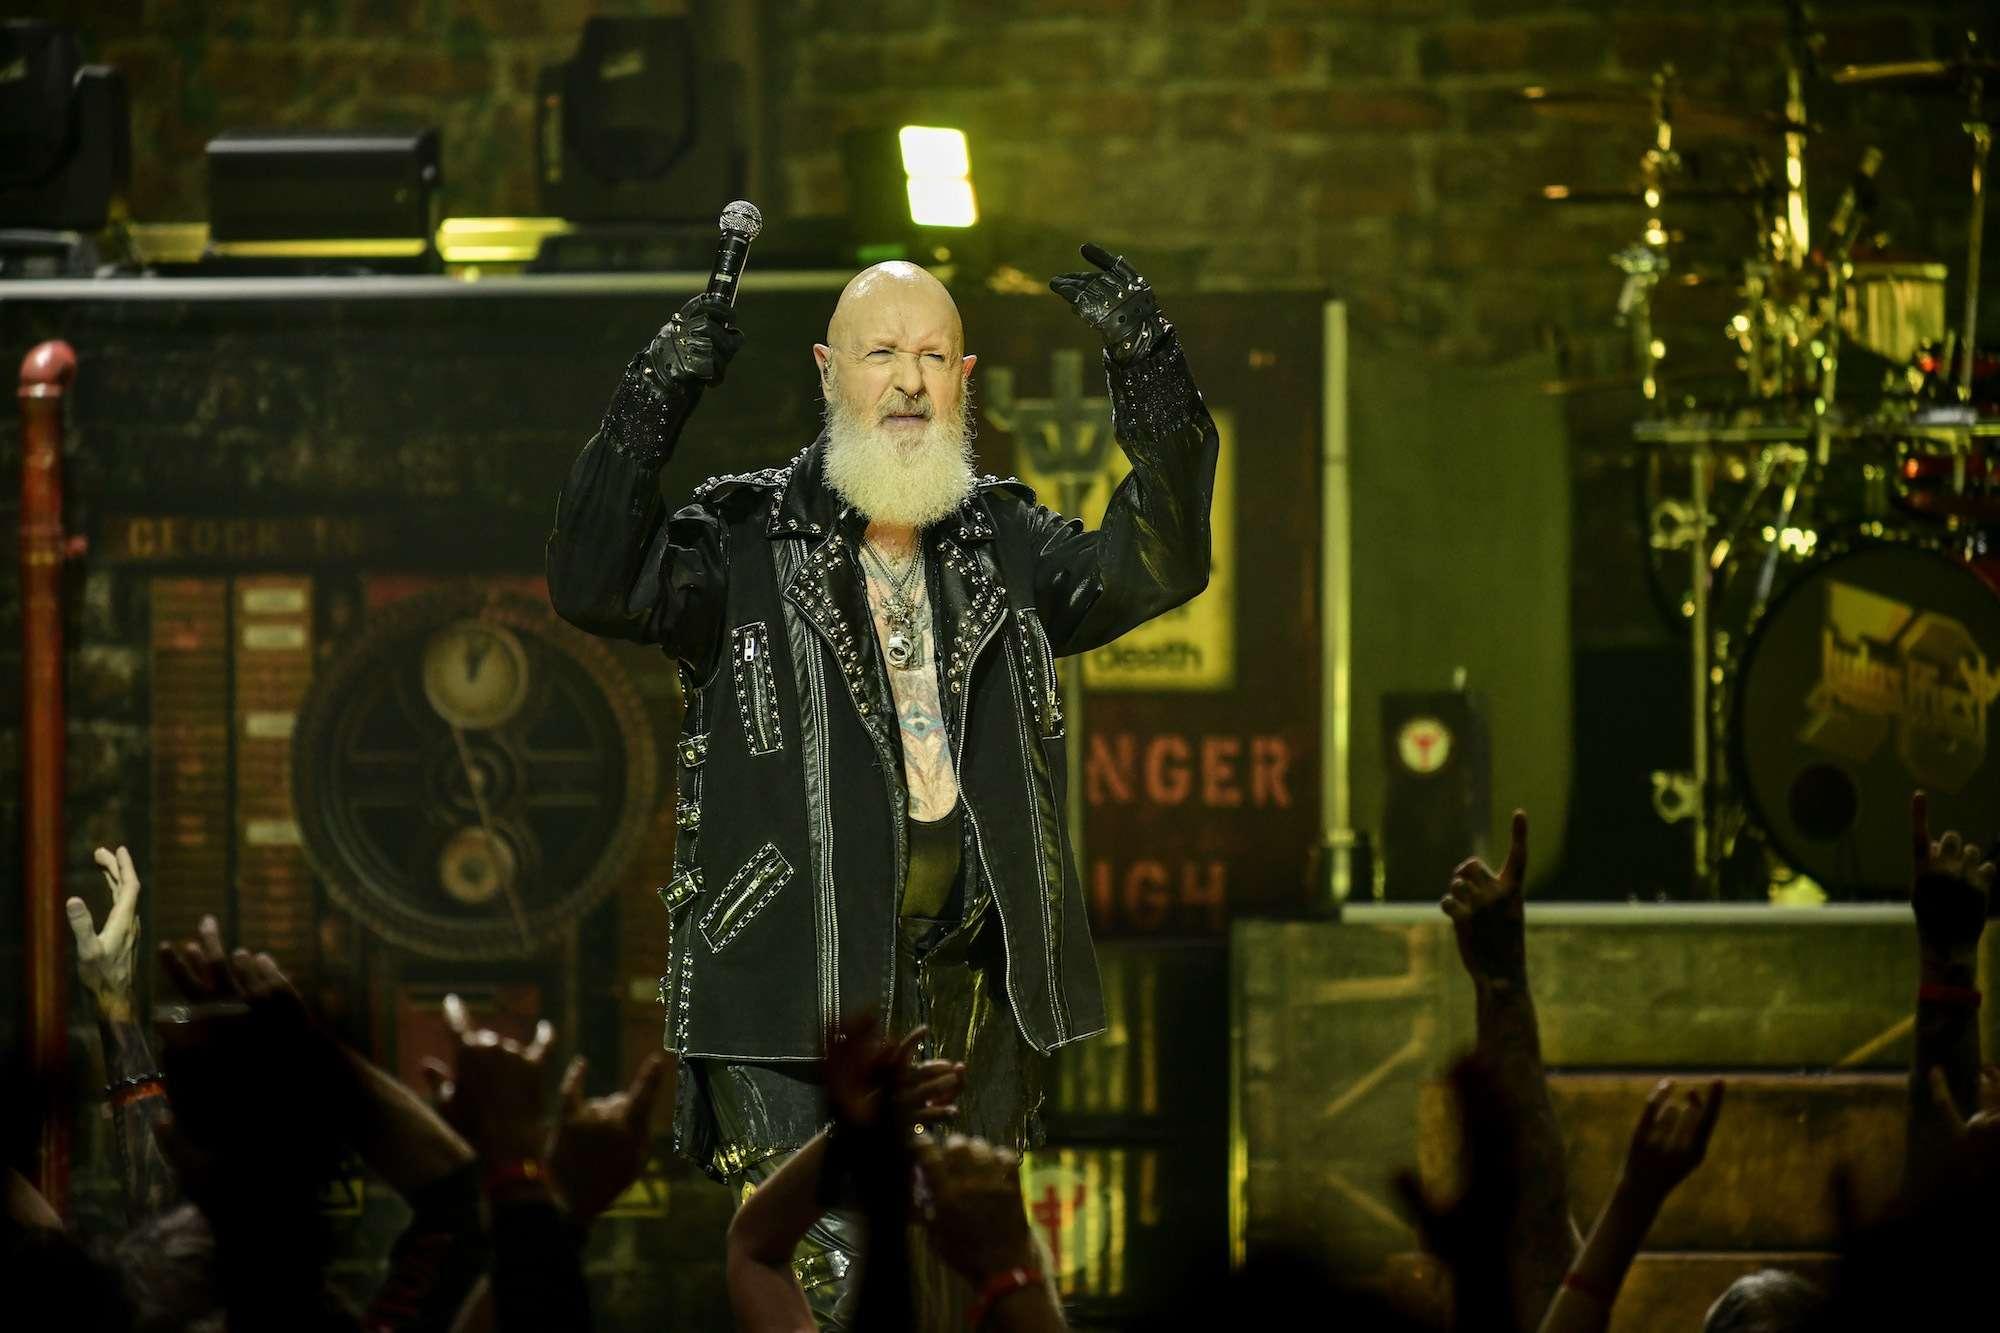 Judas Priest Live at Rosemont Theatre [GALLERY] 5